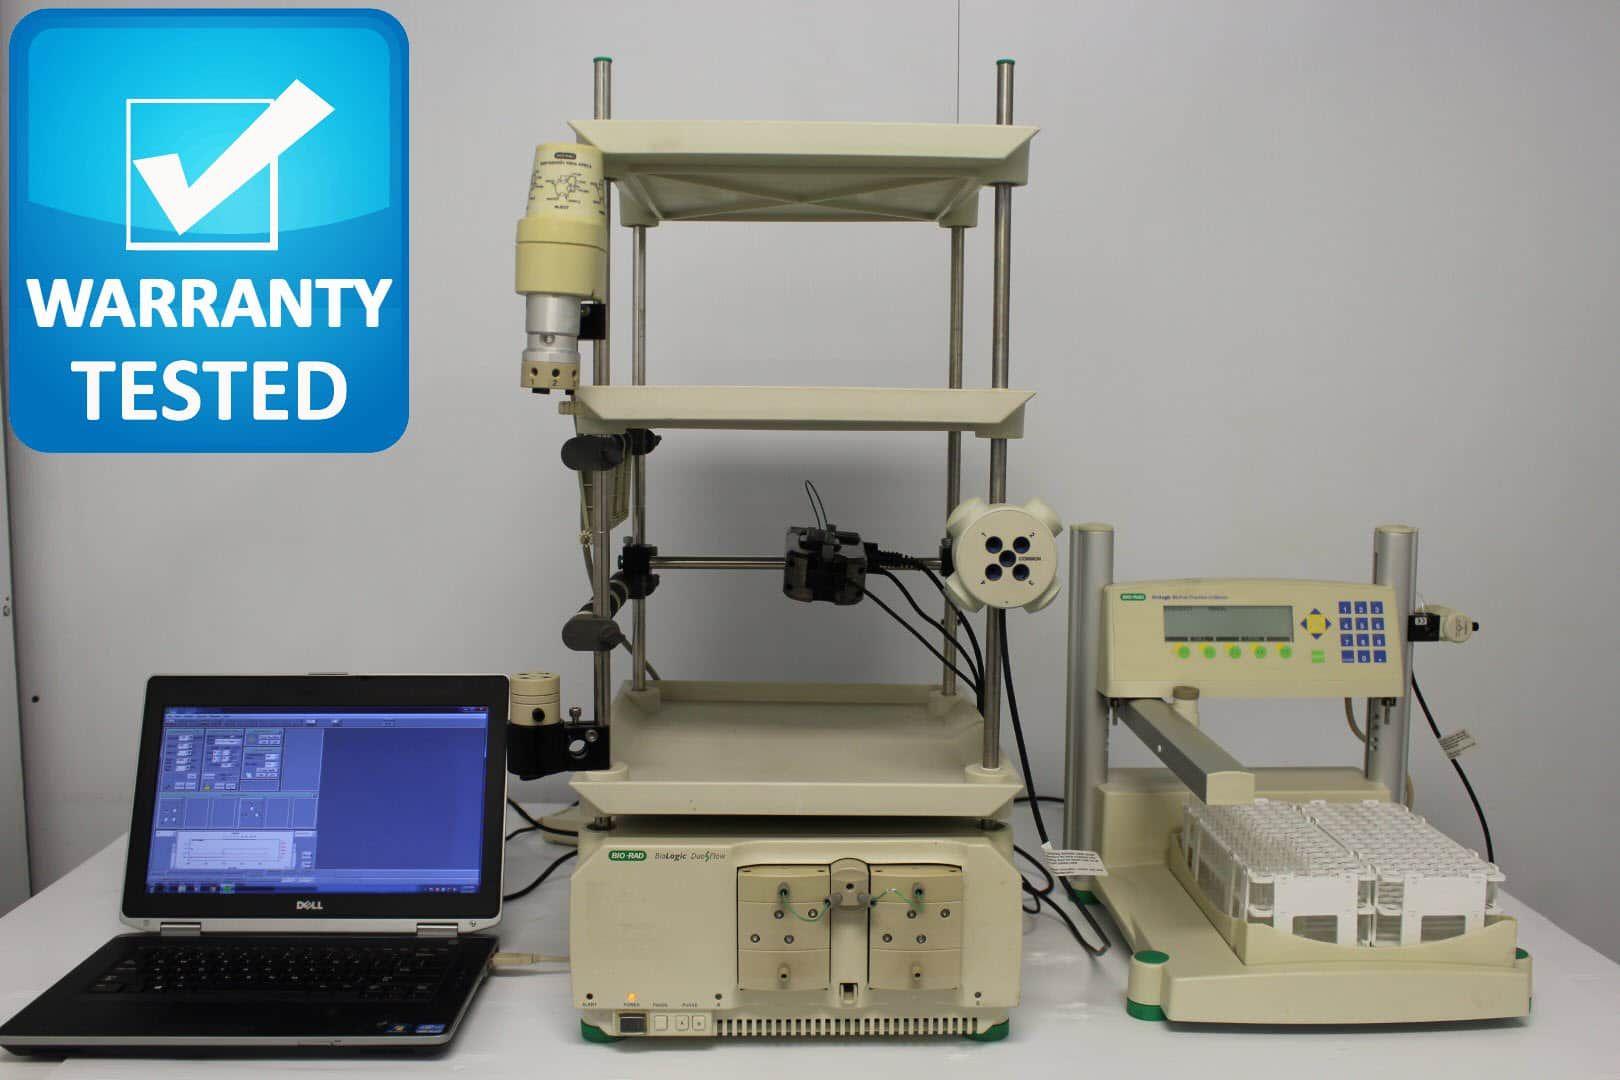 Bio-Rad DuoFlow Chromatography System